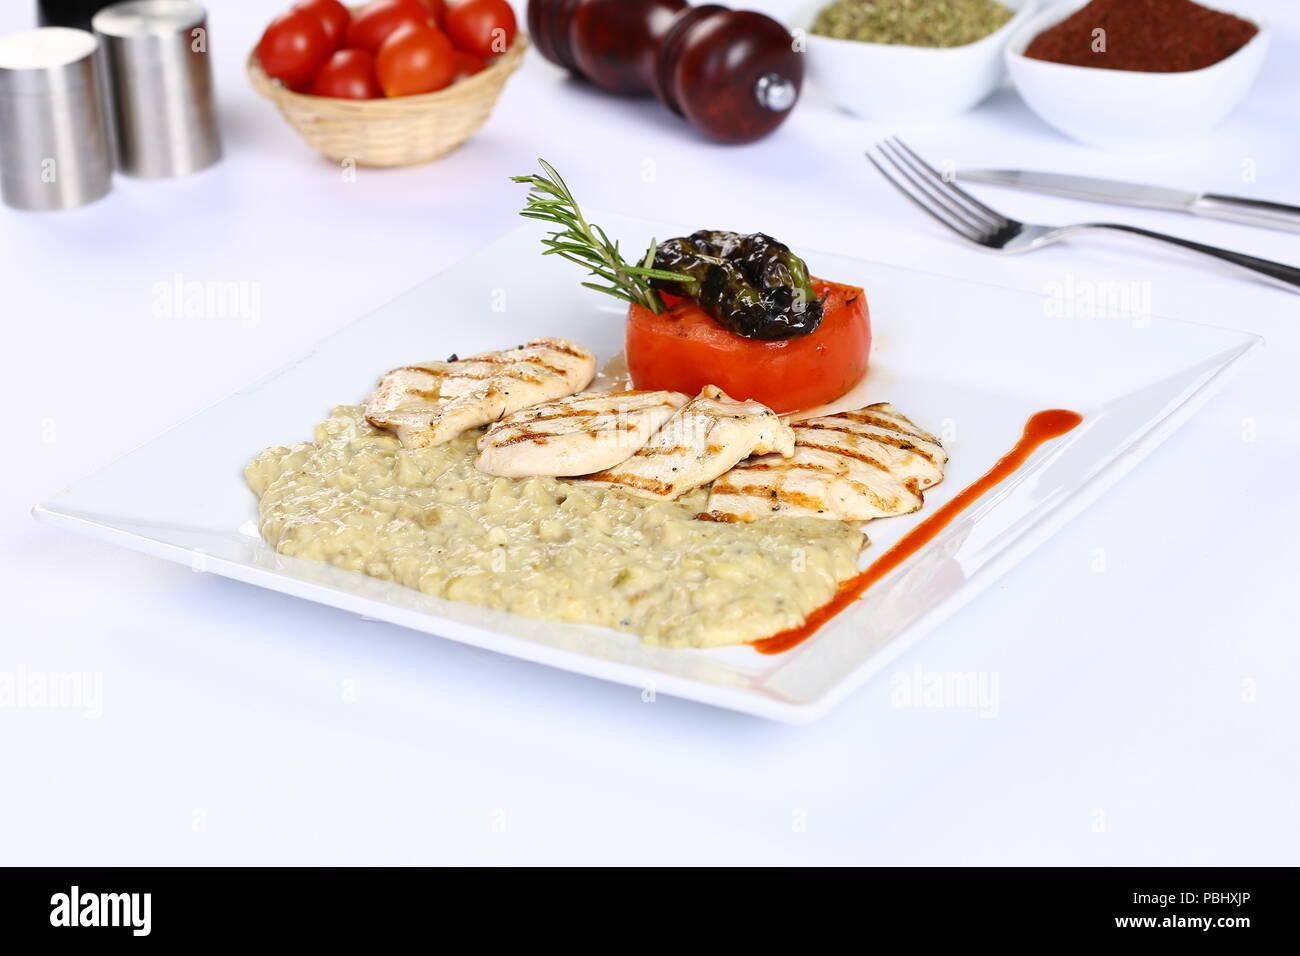 Grill fish fillet with tarator, humus - Stock Image